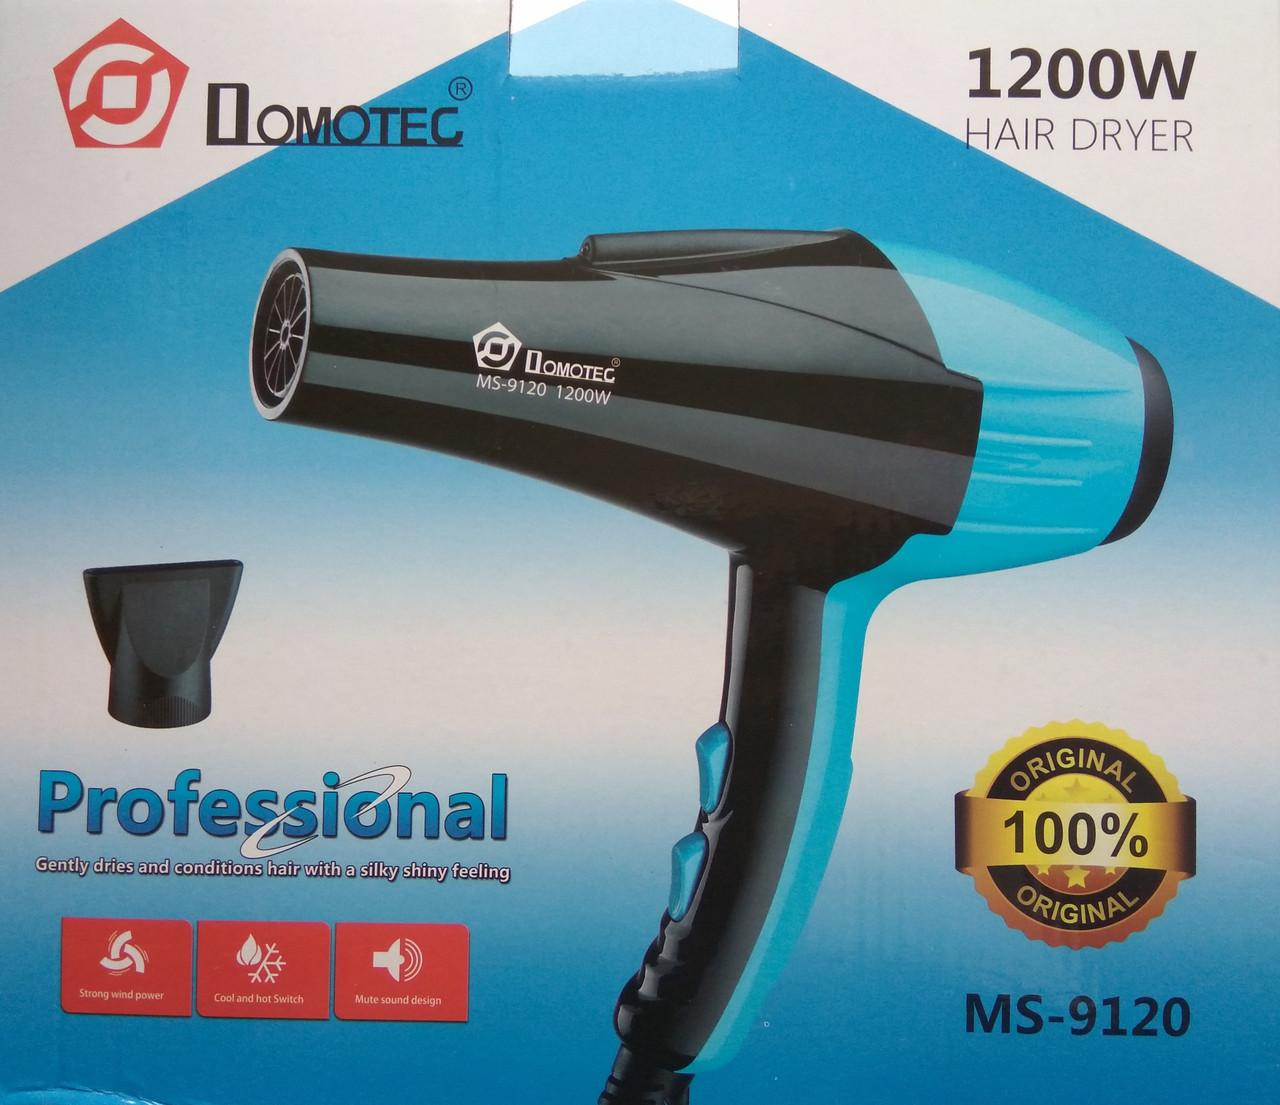 Фен для волос Domotec MS 9120 1200W  продажа 7d6c4e504caa6